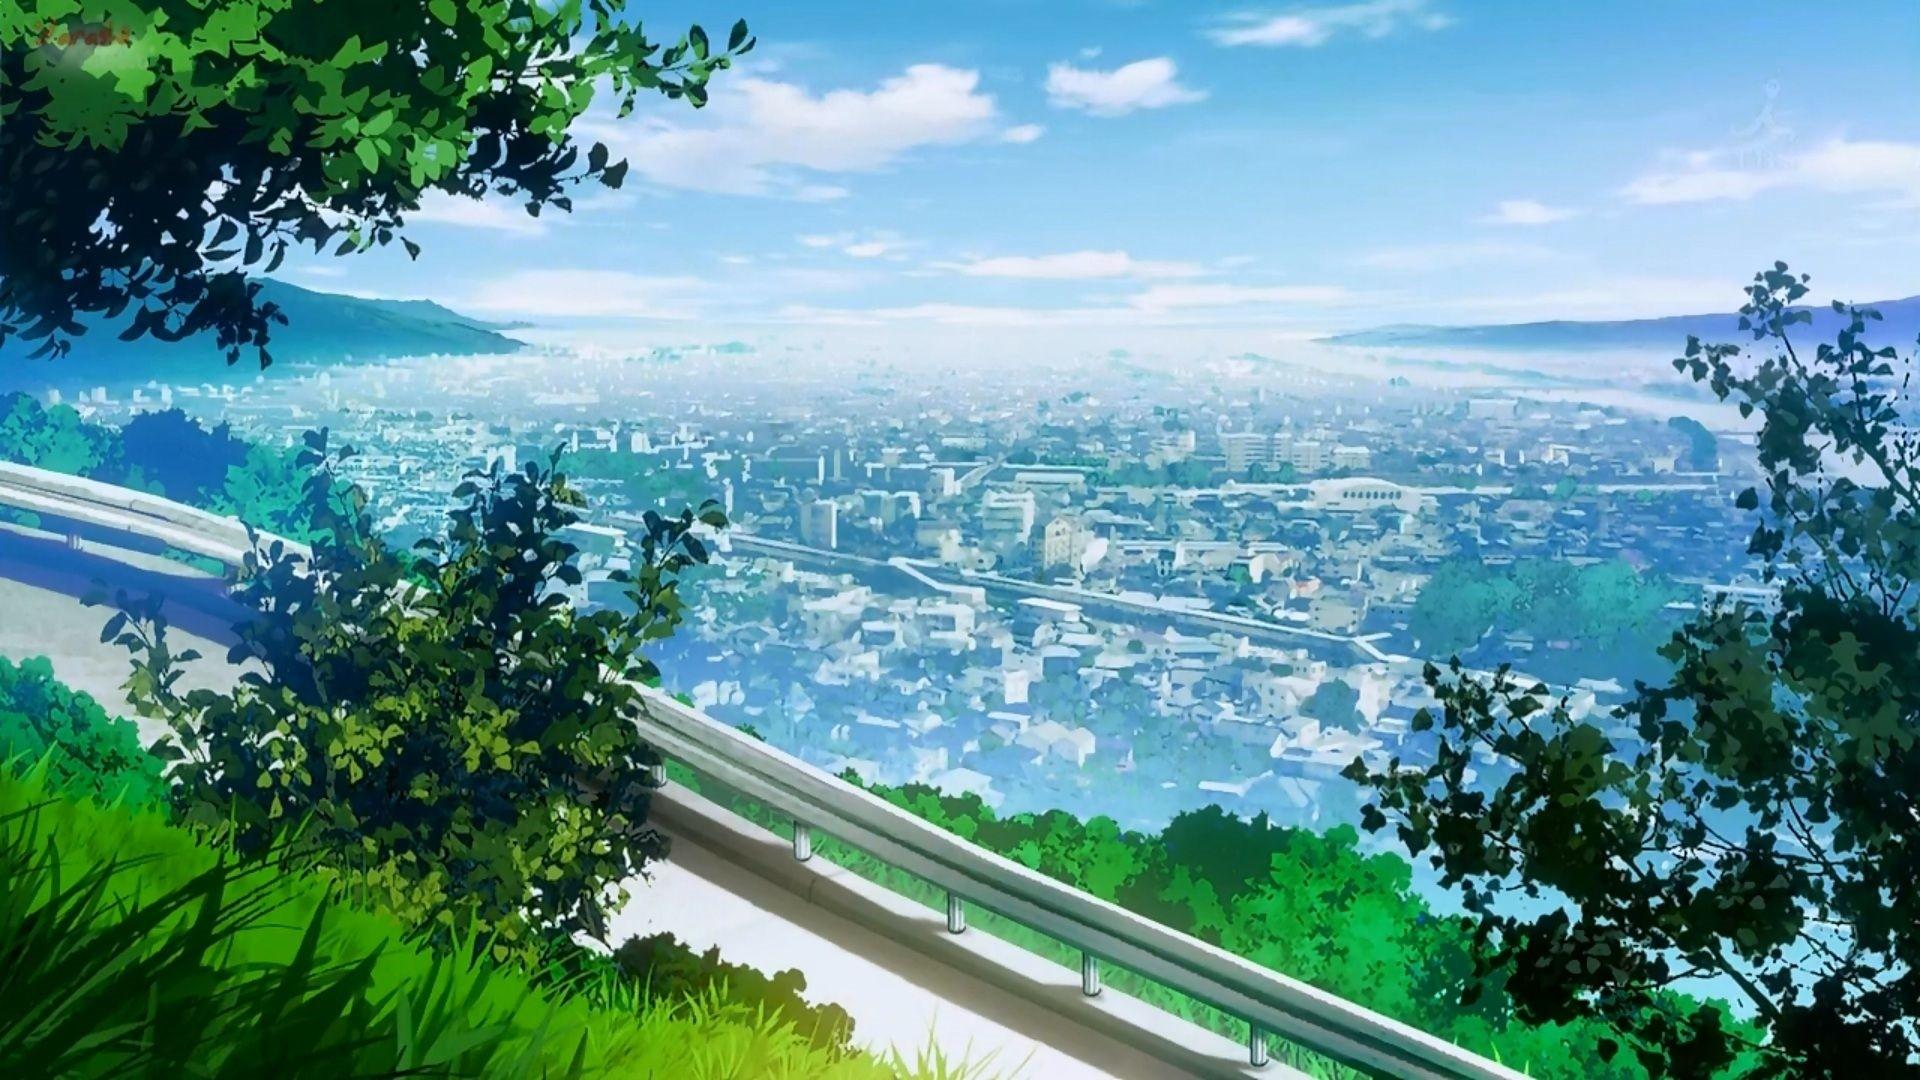 Anime Scenery wallpaper photo hd